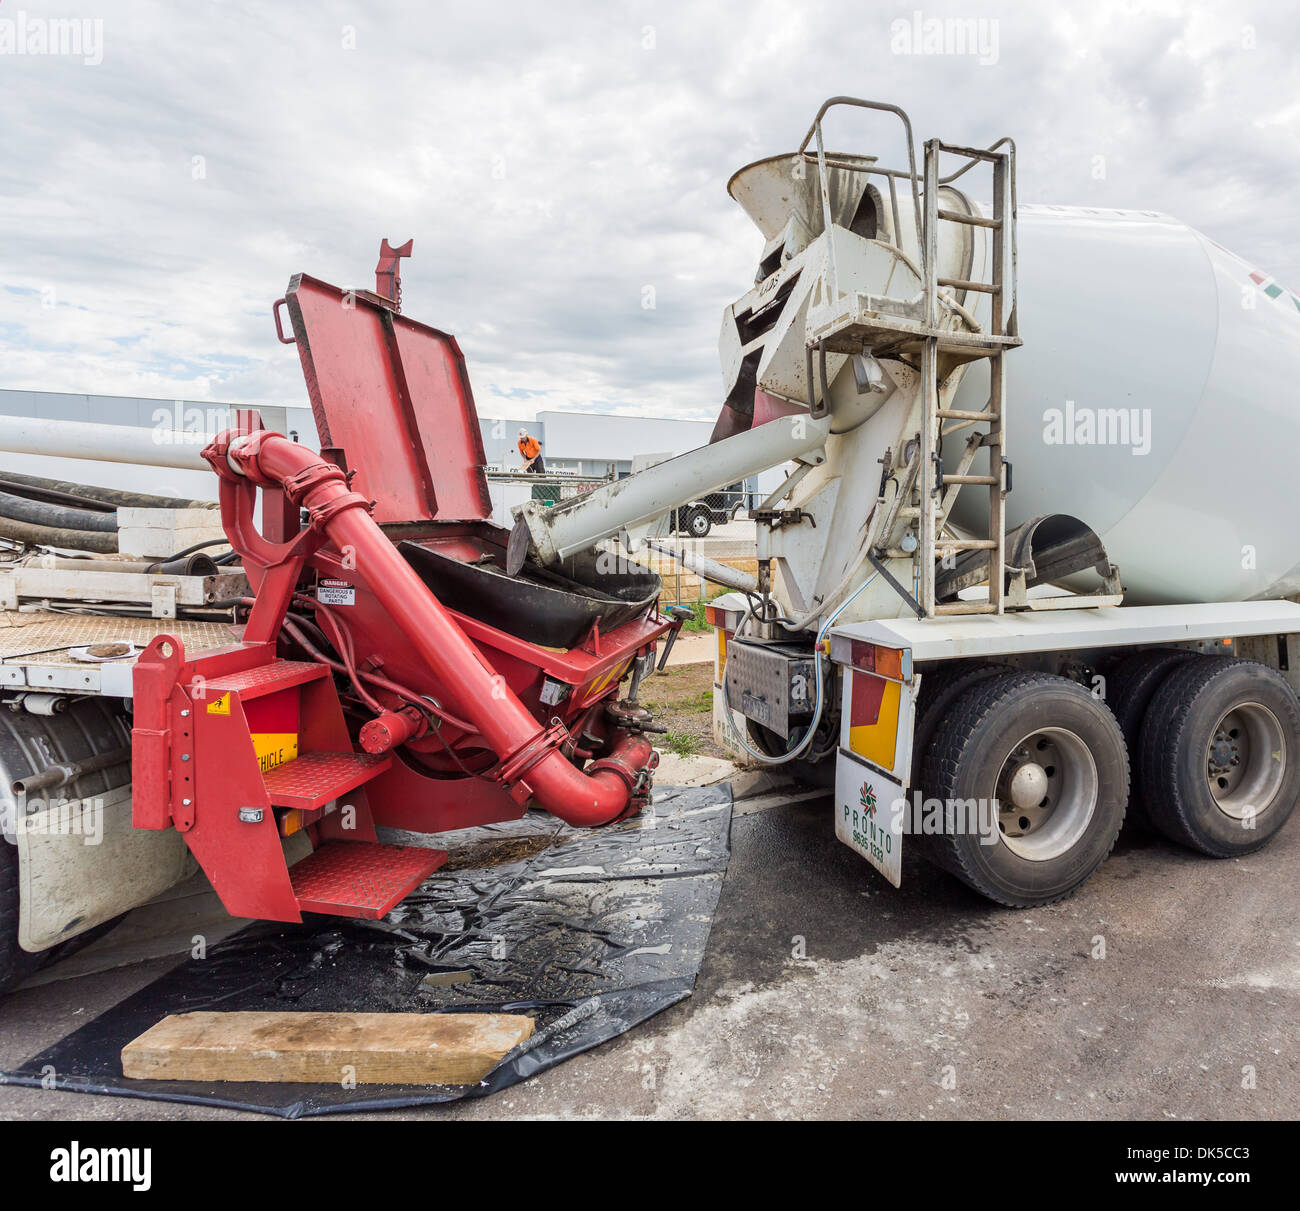 Pump Truck Stock Photos & Pump Truck Stock Images - Alamy